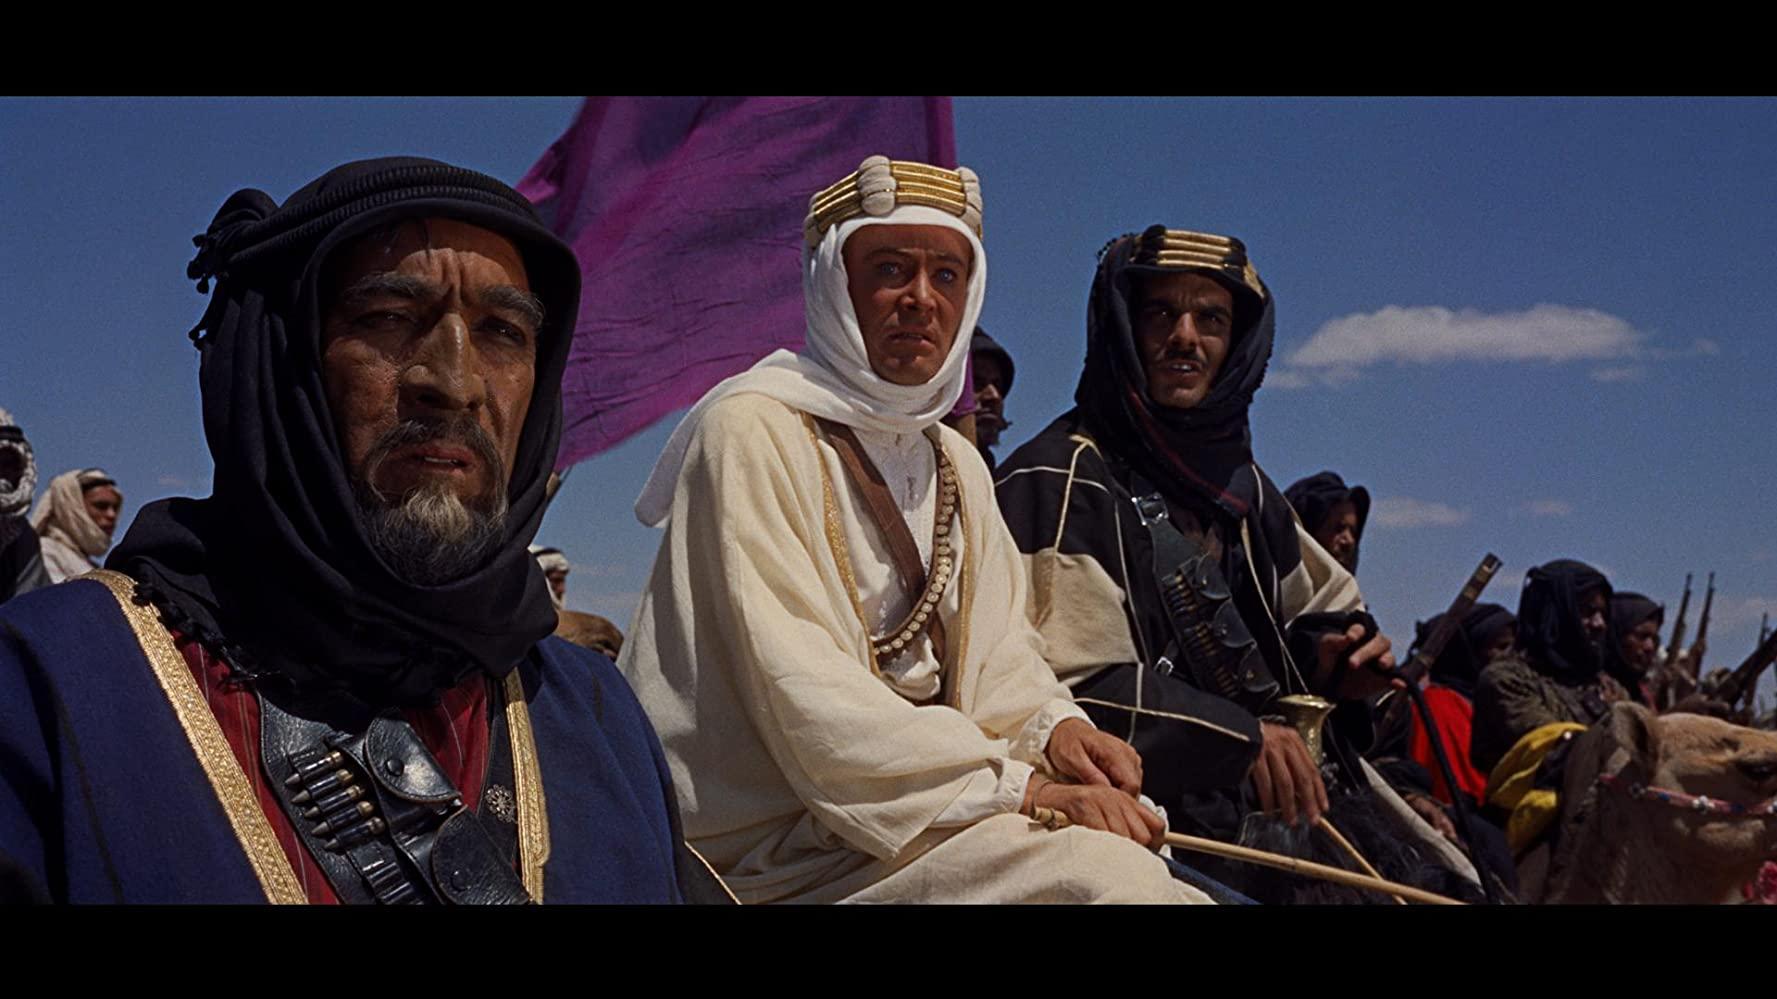 دانلود فیلم لورنس عربستان